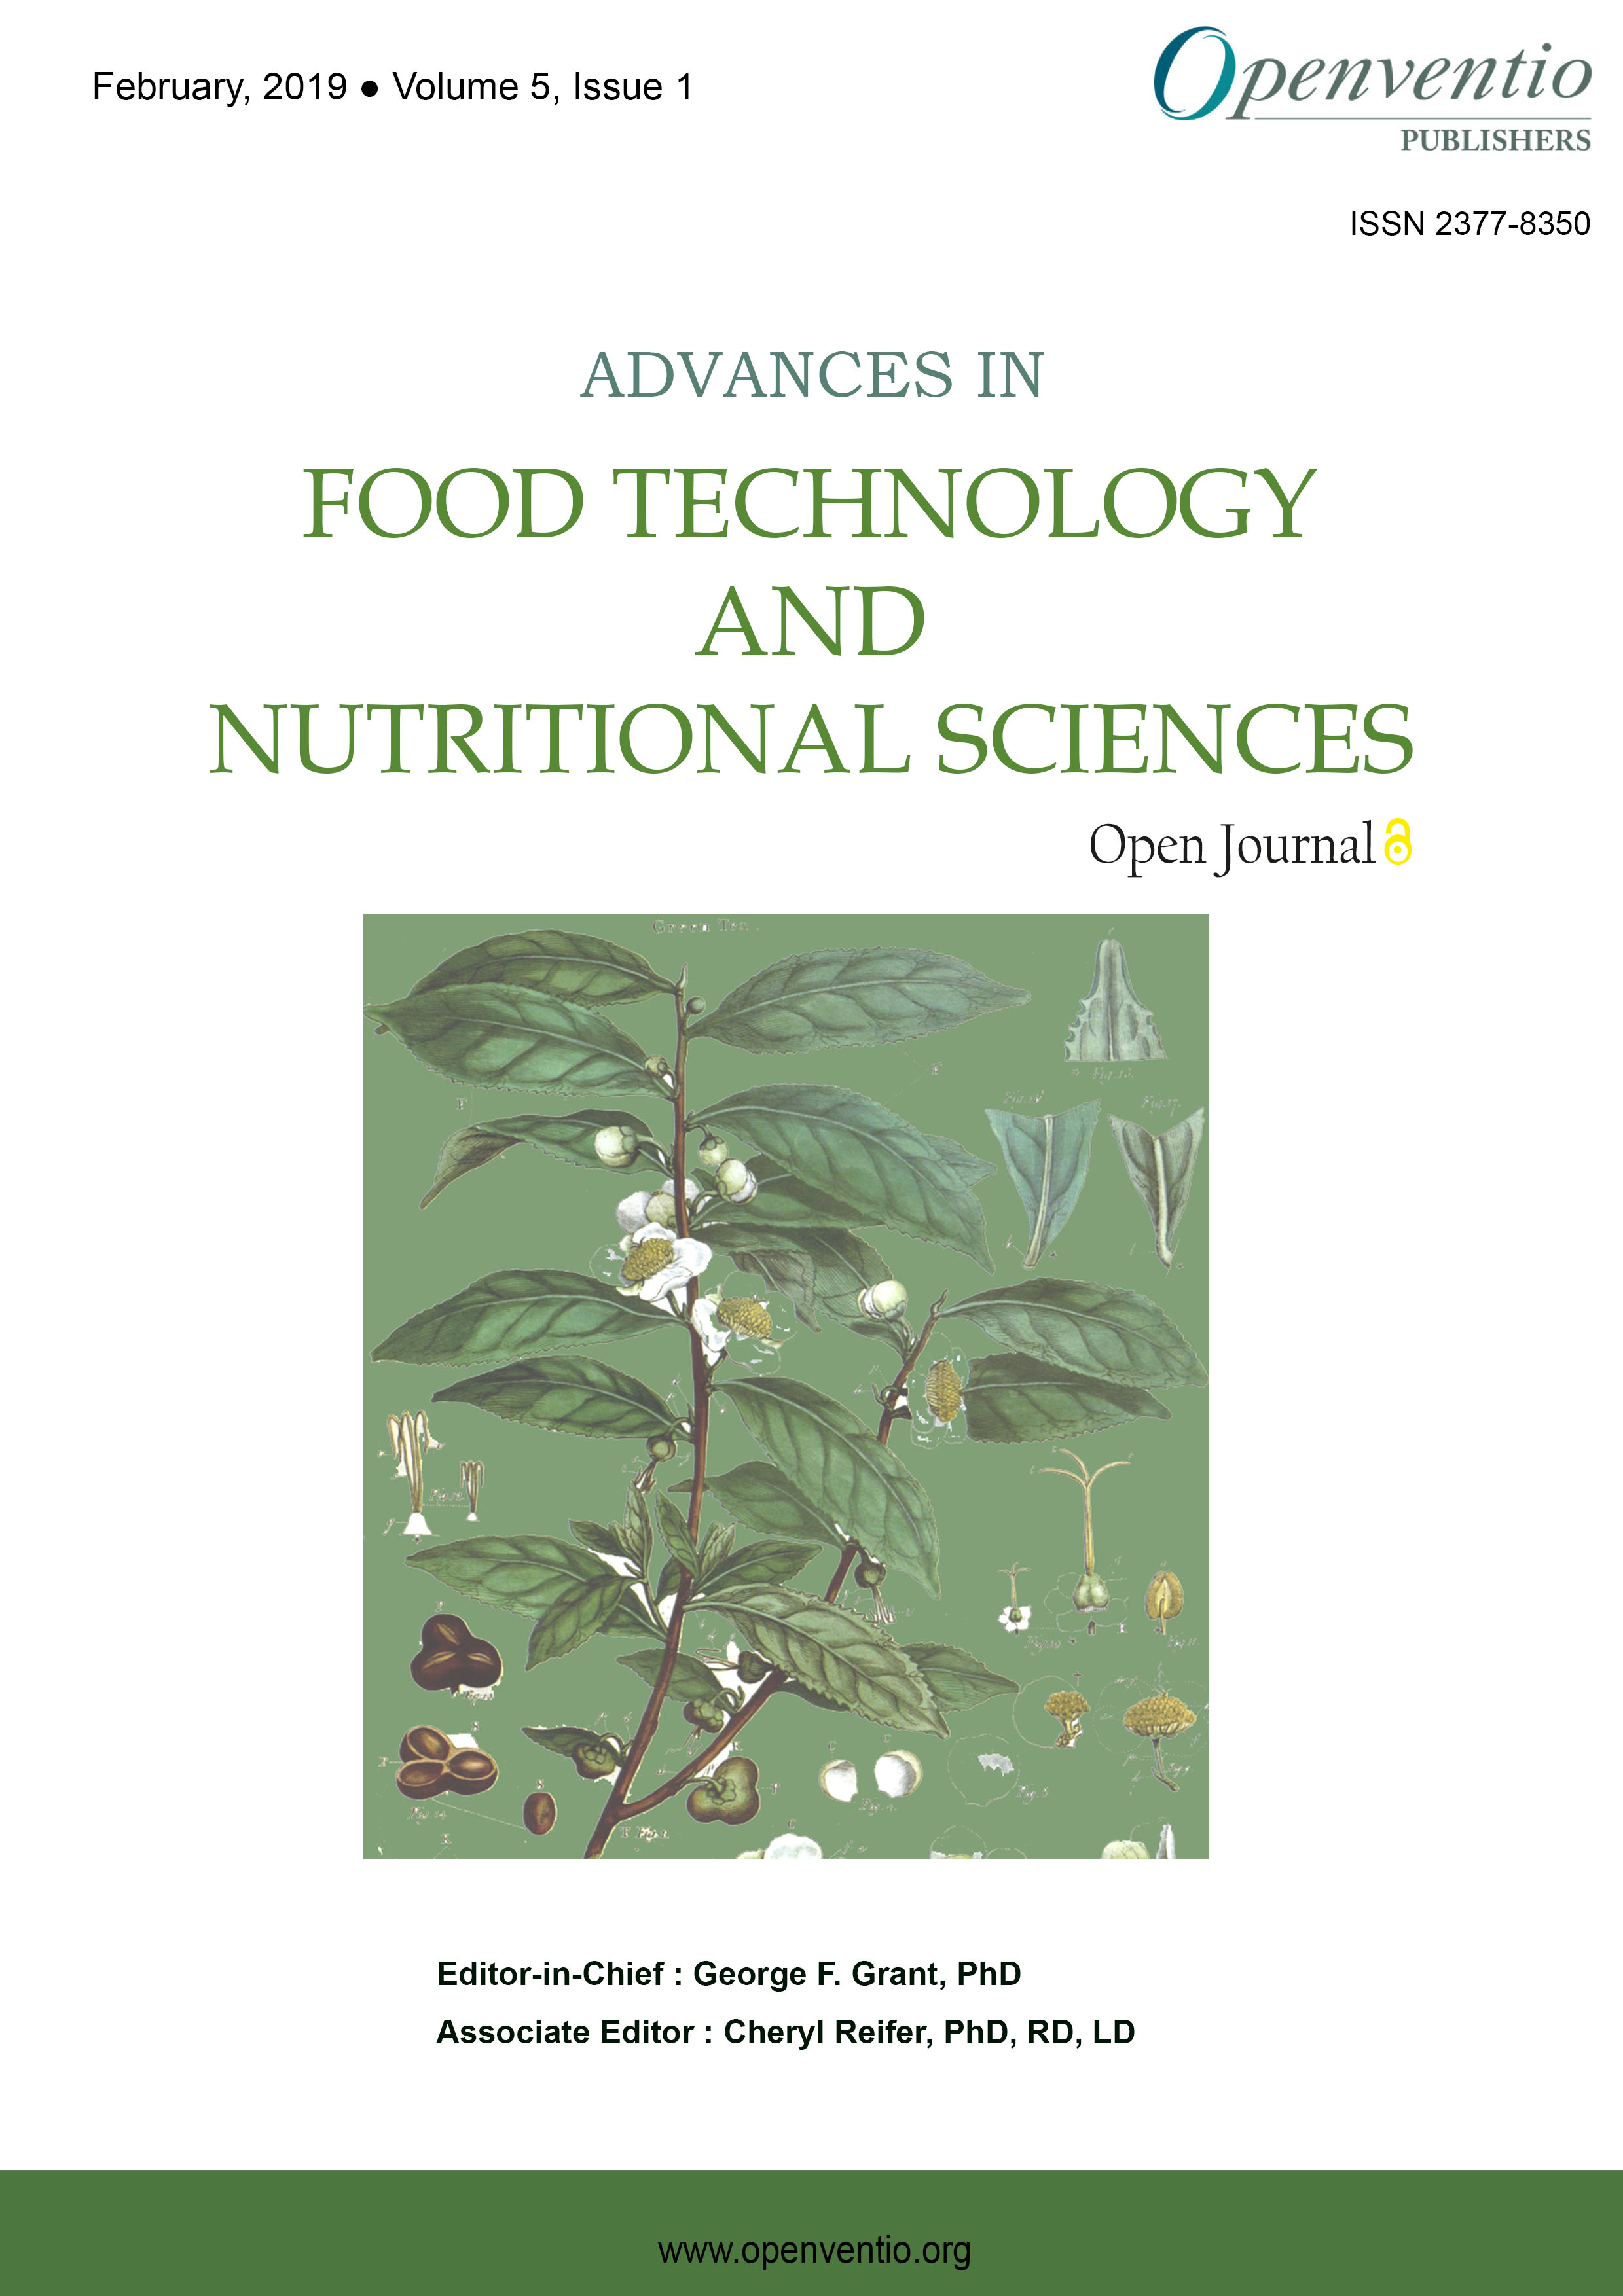 Organo-Protective Effect of Moringa oleifera (Moringa) and